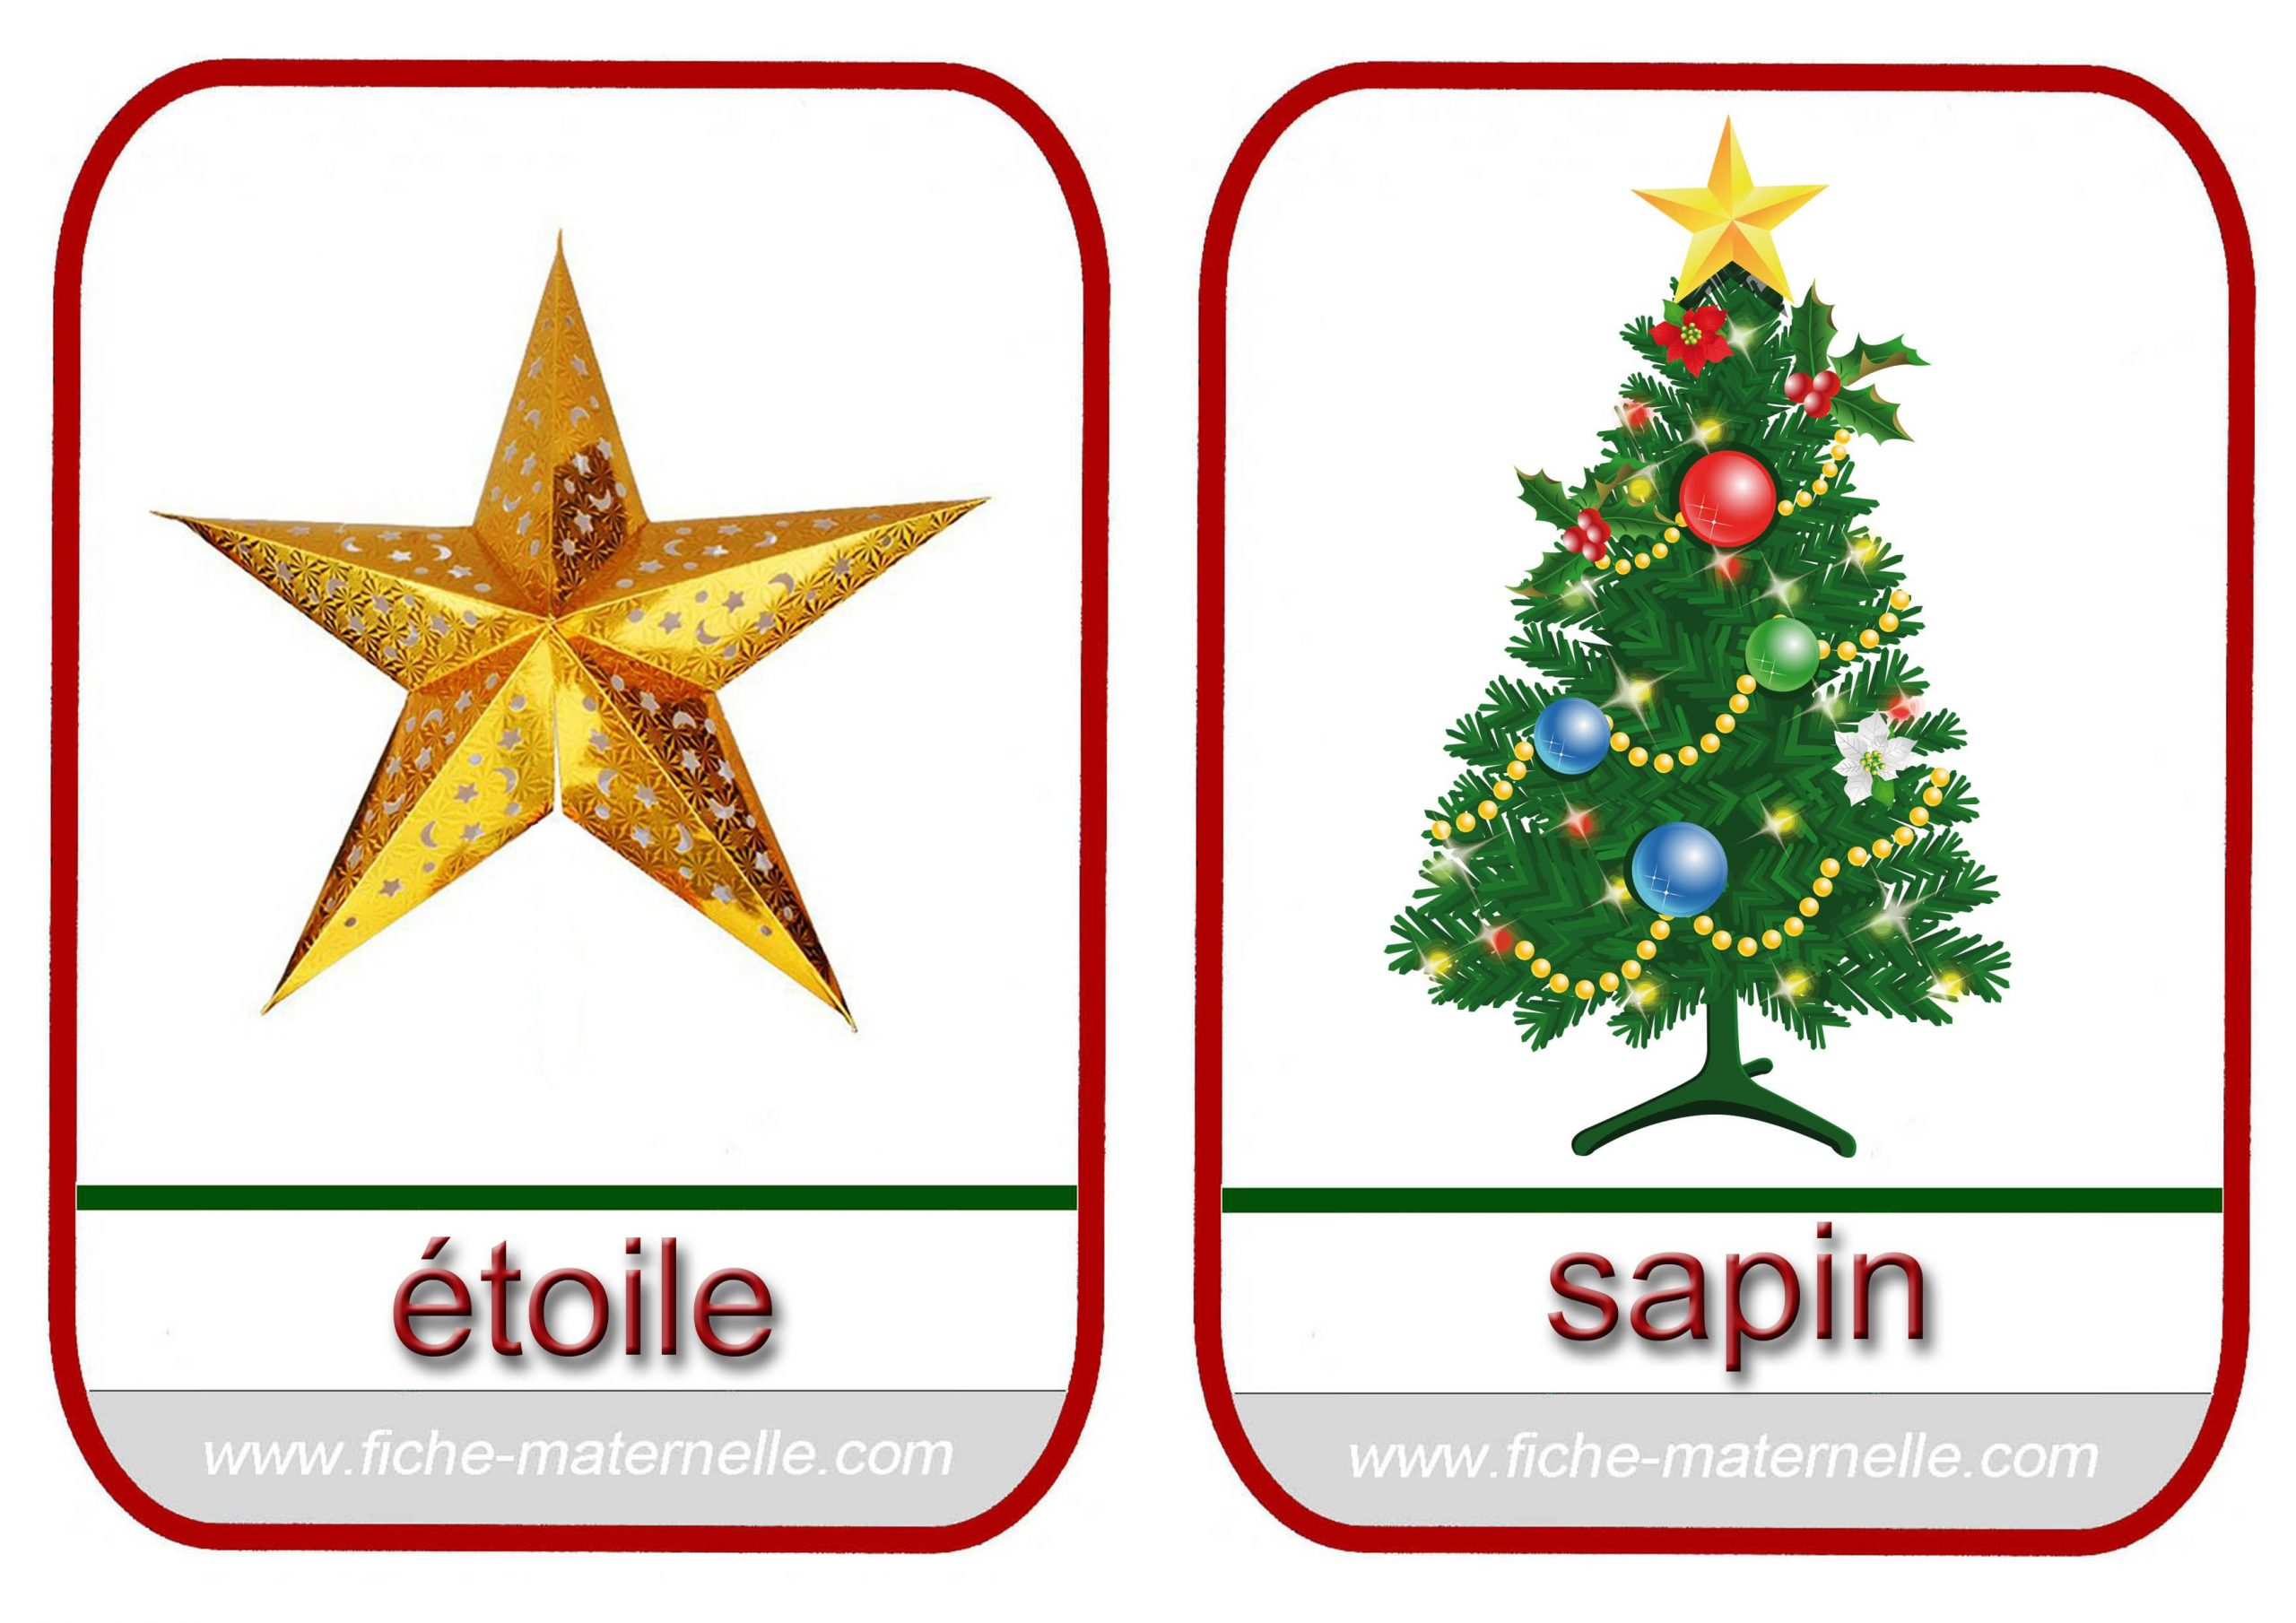 Imagier De Noël | Noel, Noel Maternelle, Imagier Noël Maternelle avec Imagier Noel Maternelle